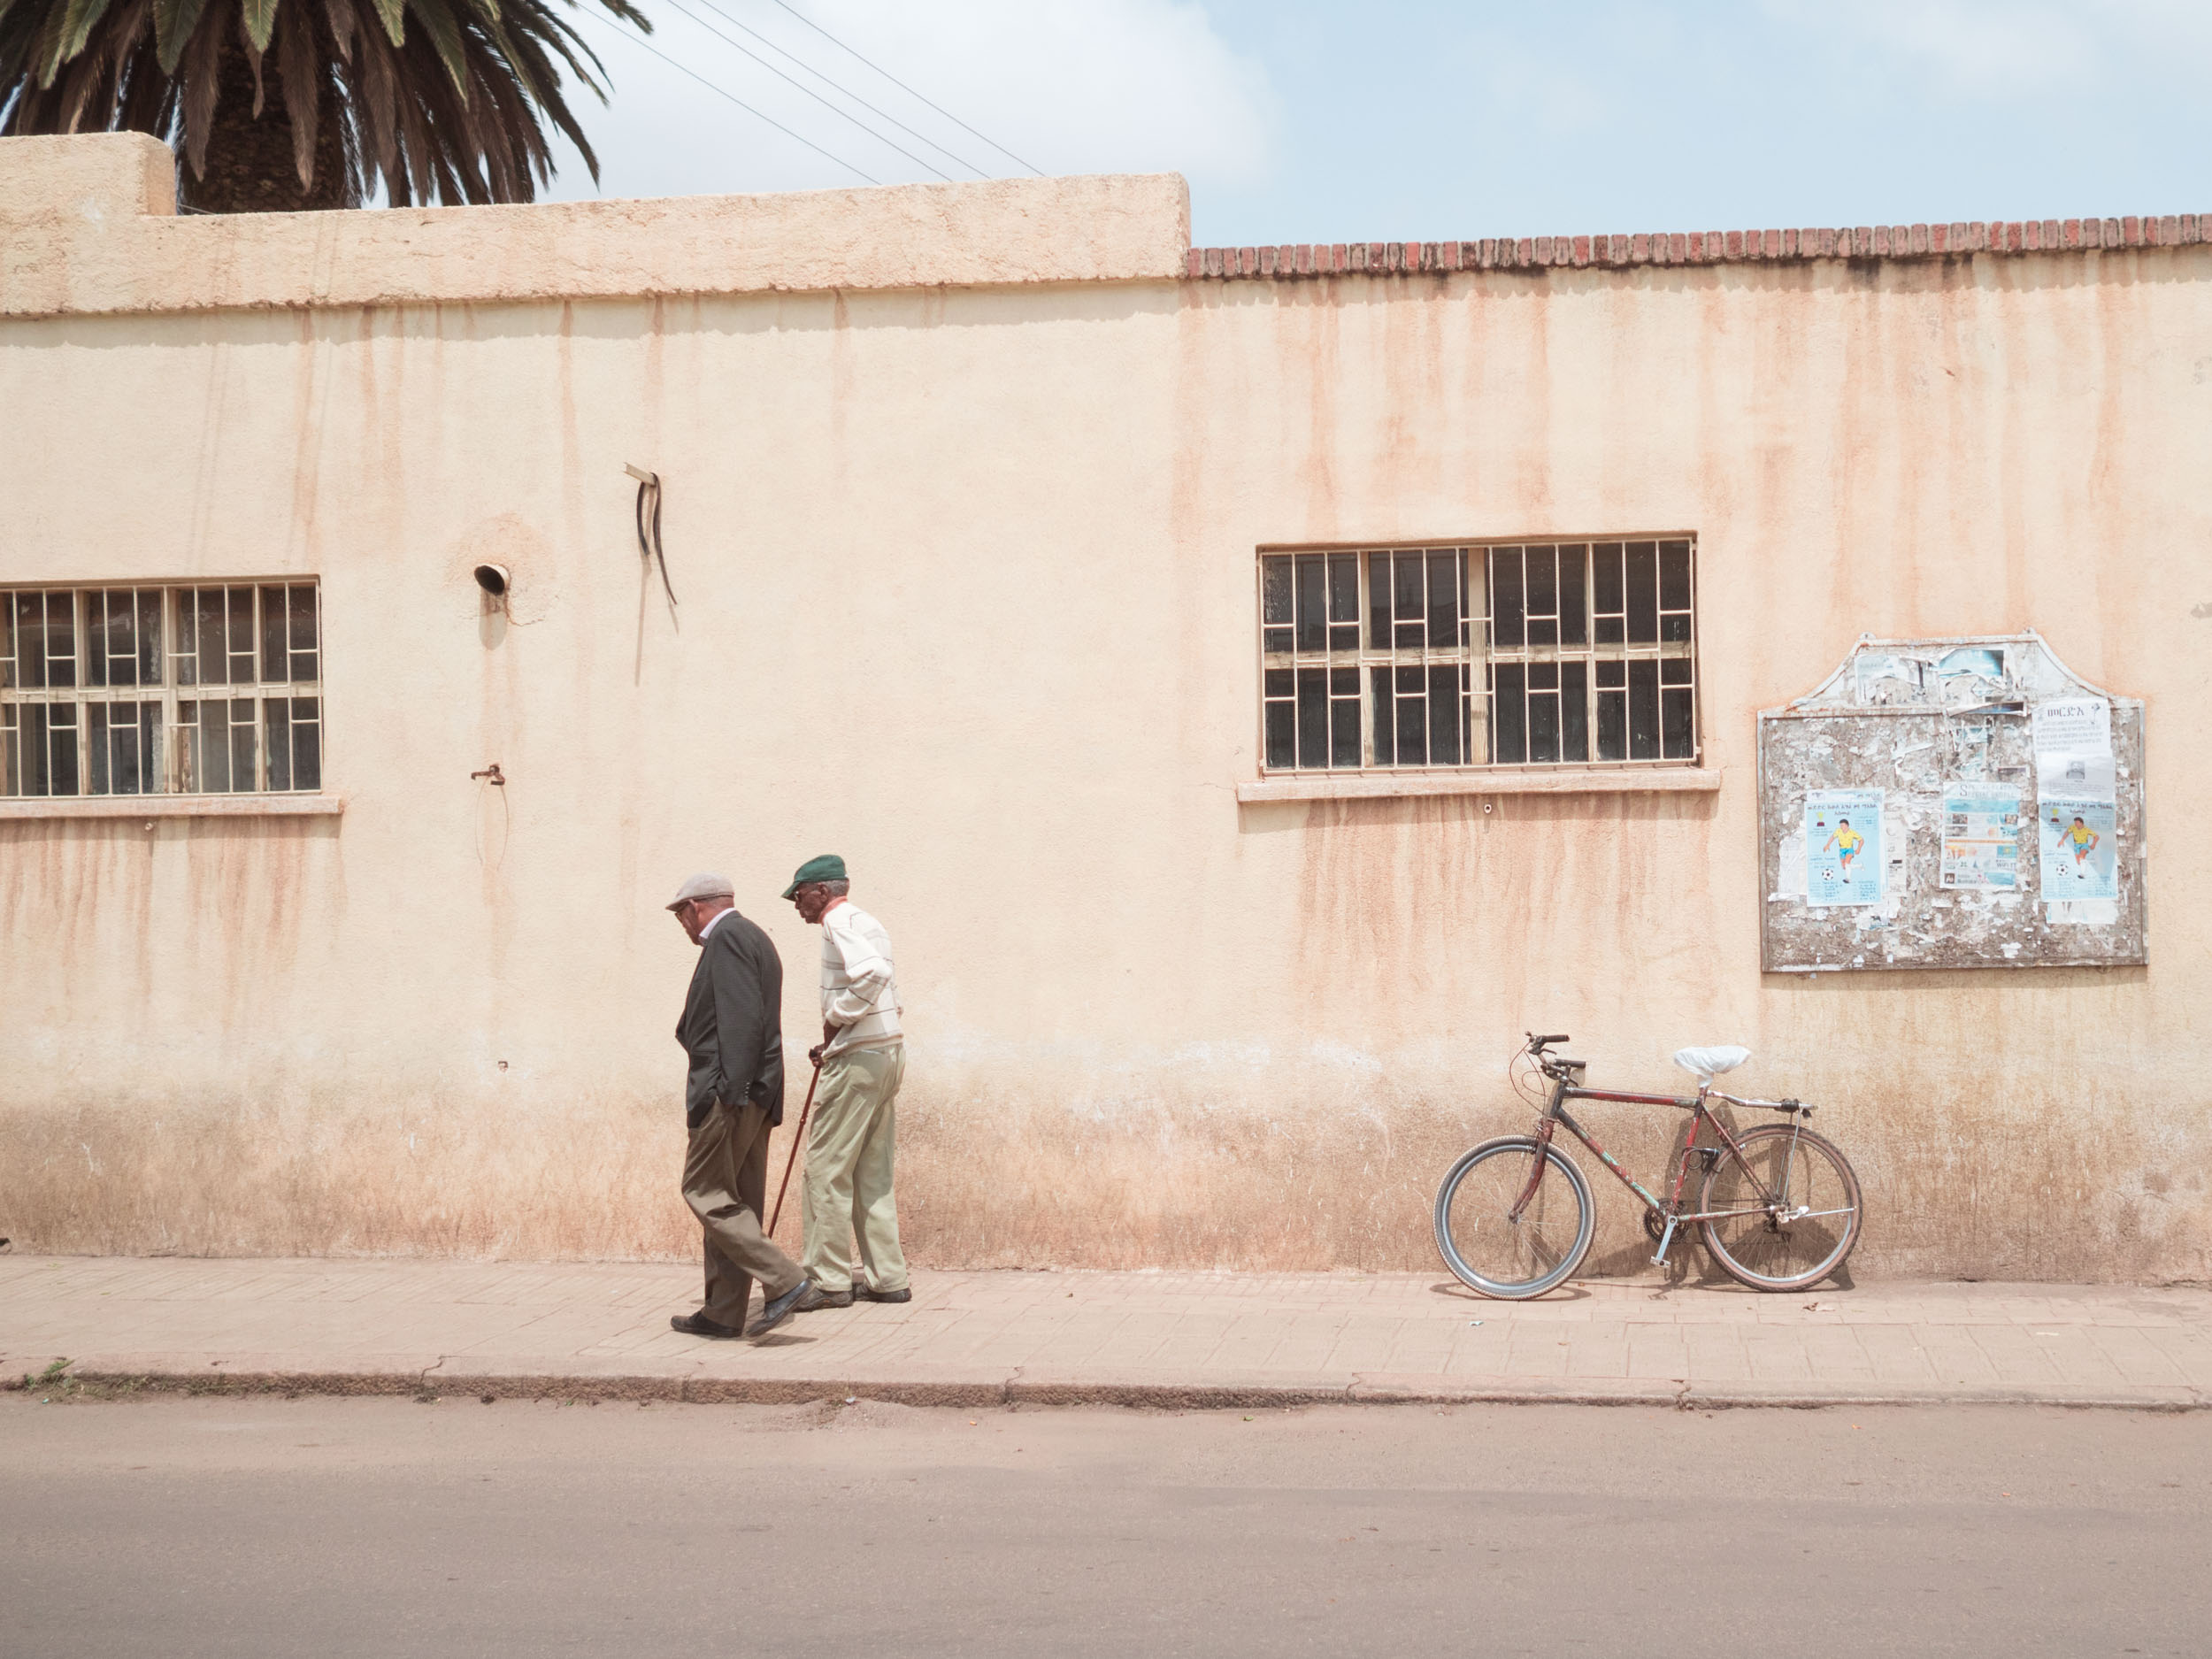 Two old men walking in the streets of Asmara, Eritrea.